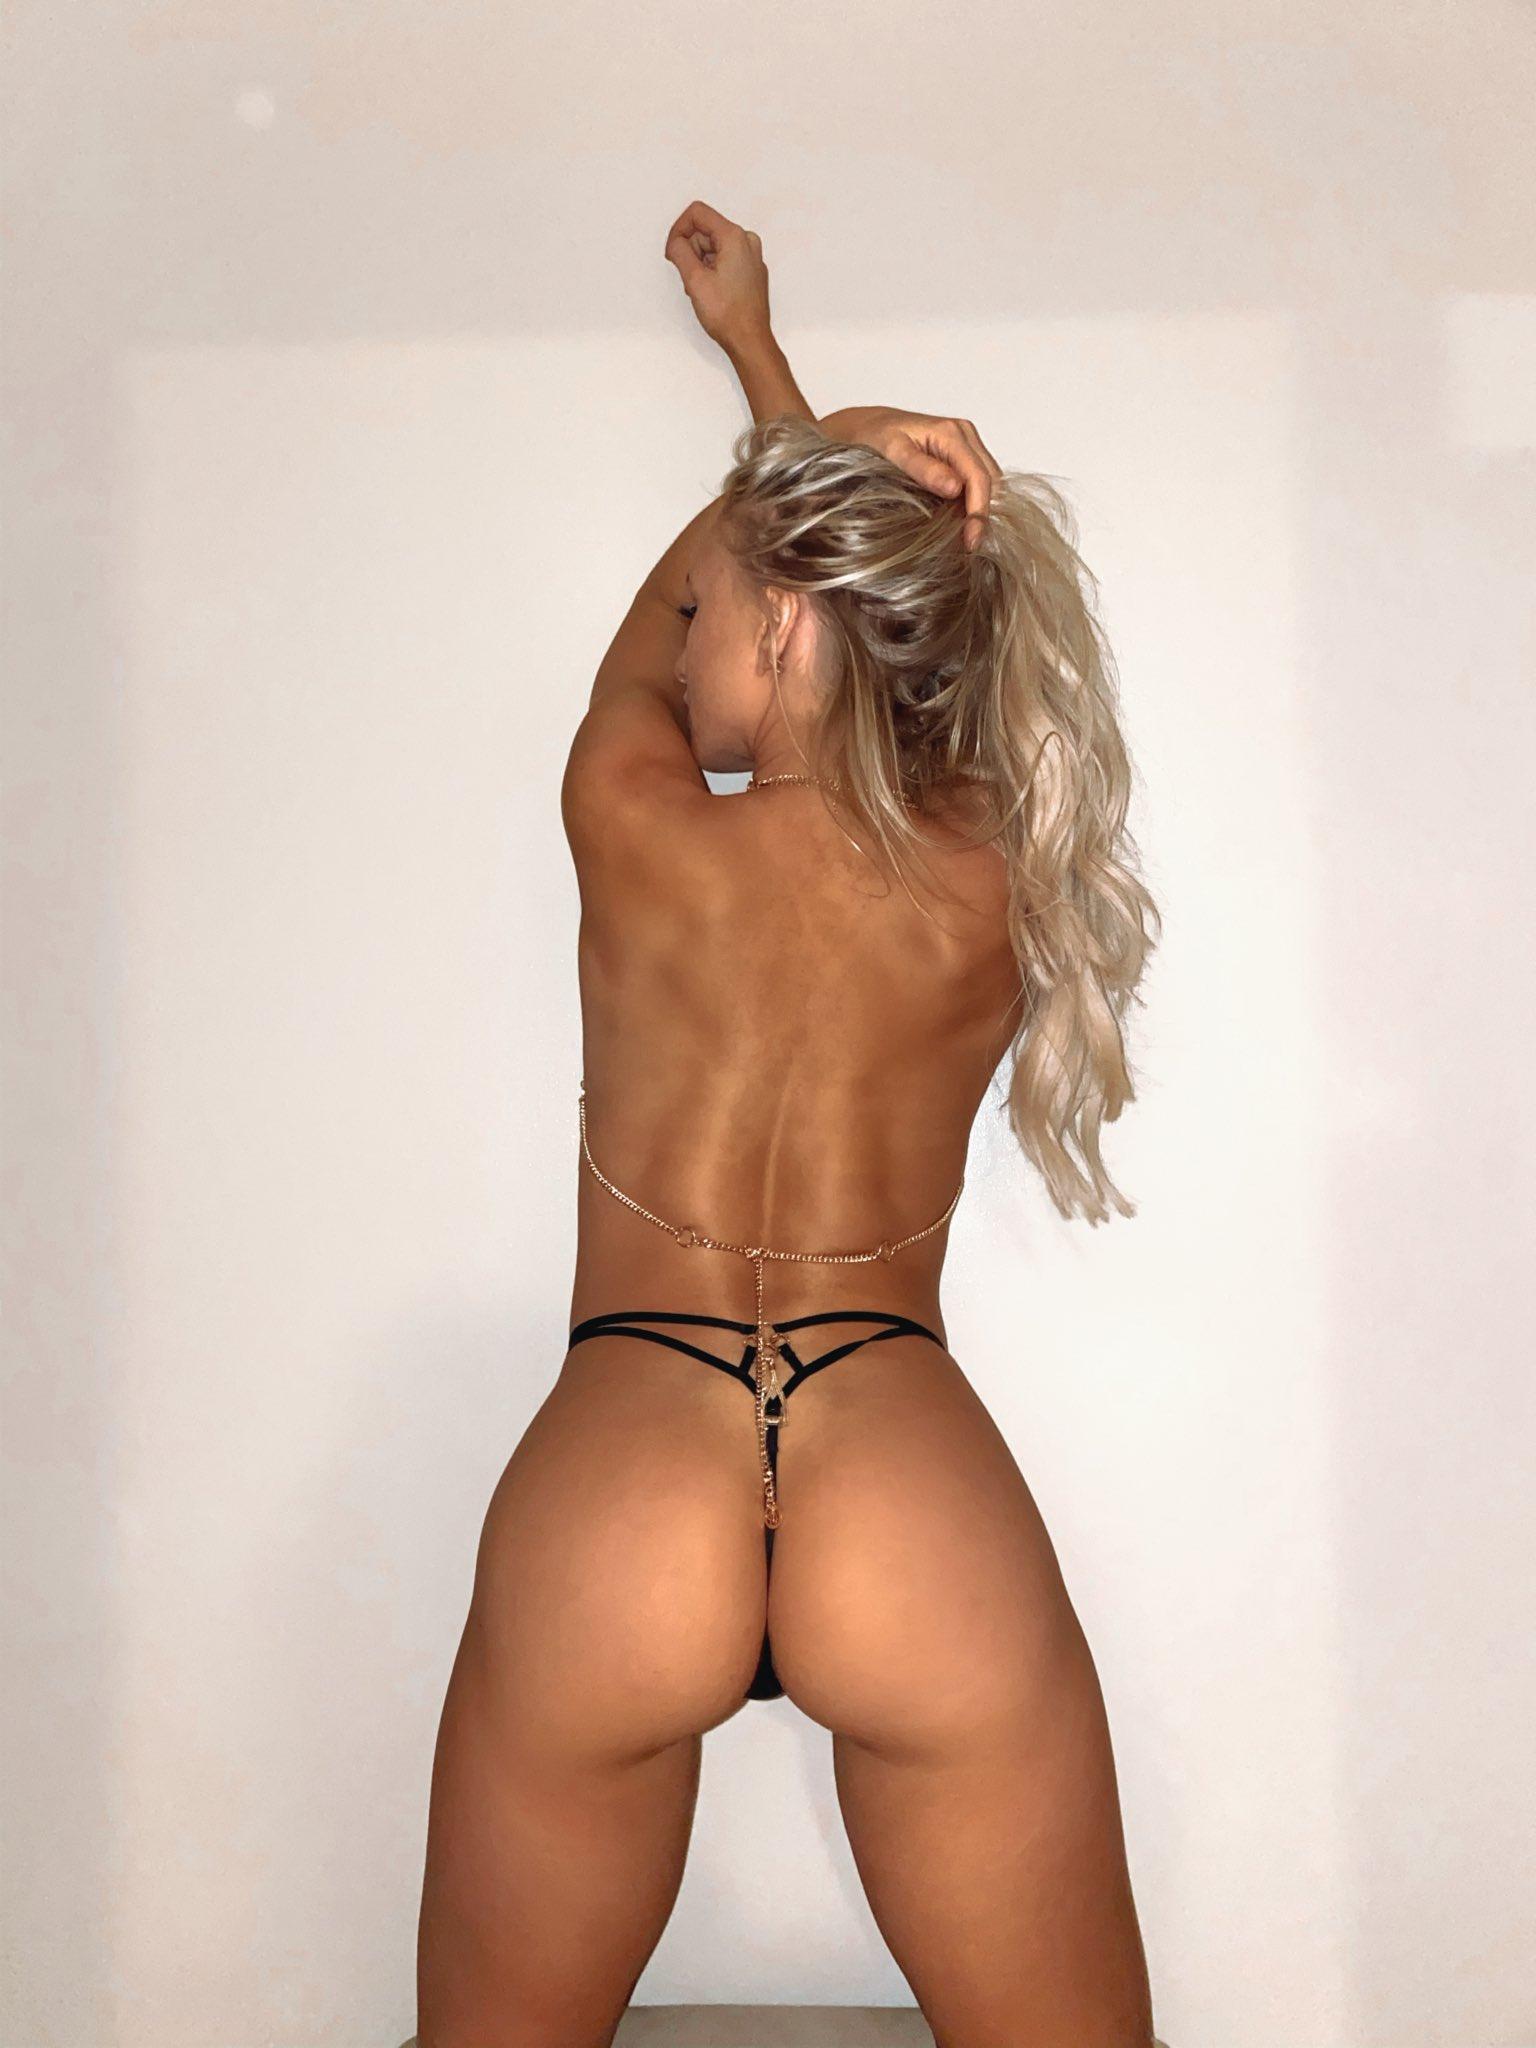 Lauren Dascalo Nude & Sex Tape Onlyfans Leaked 0005